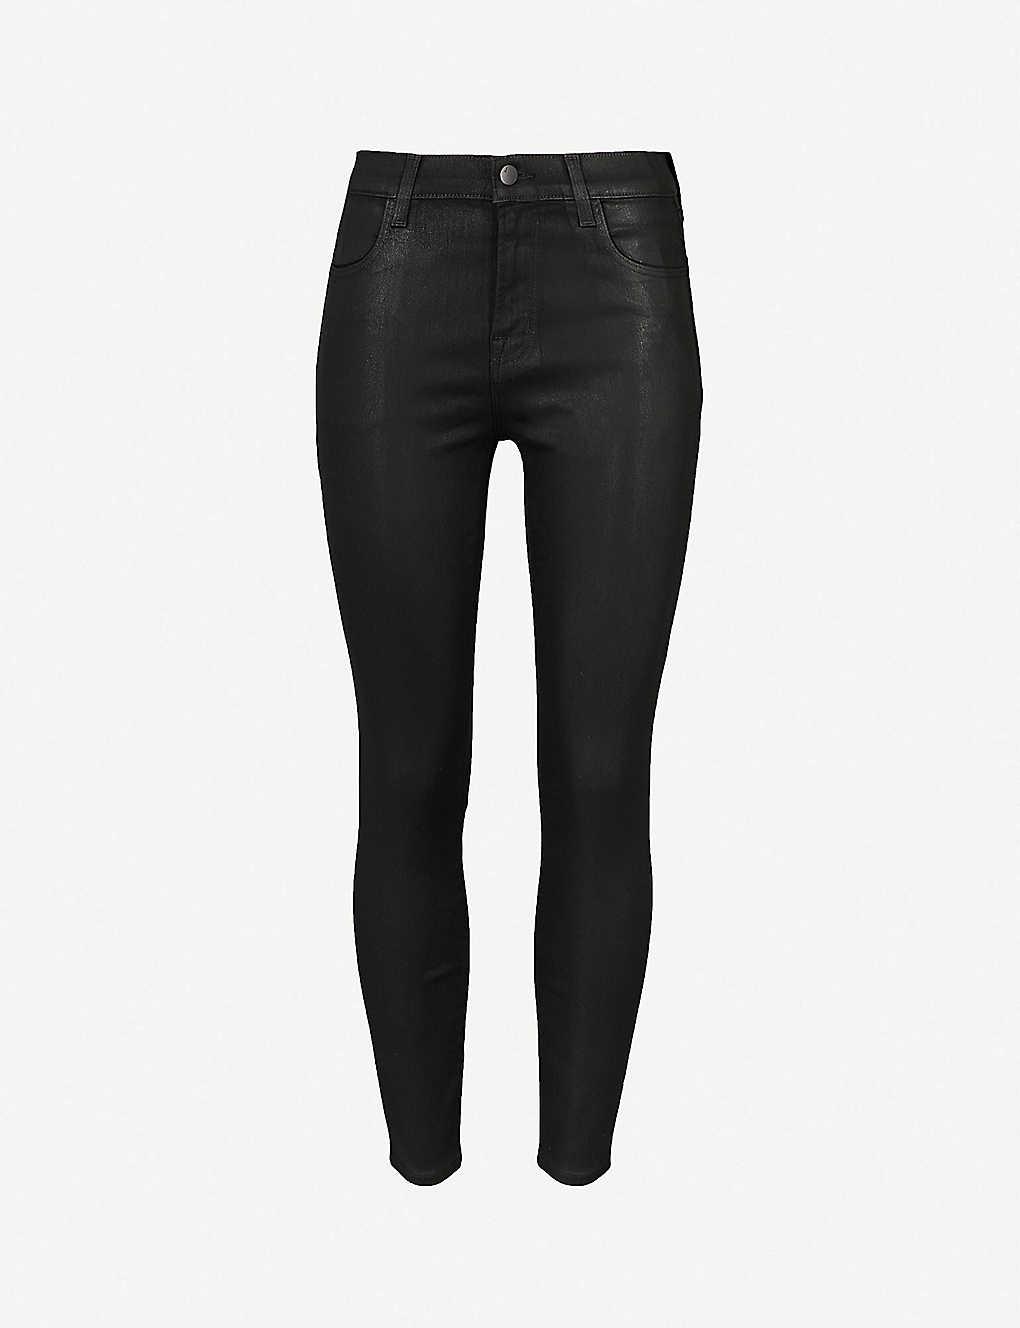 bed33c9852d J BRAND - Alana coated skinny cropped high-rise jeans   Selfridges.com